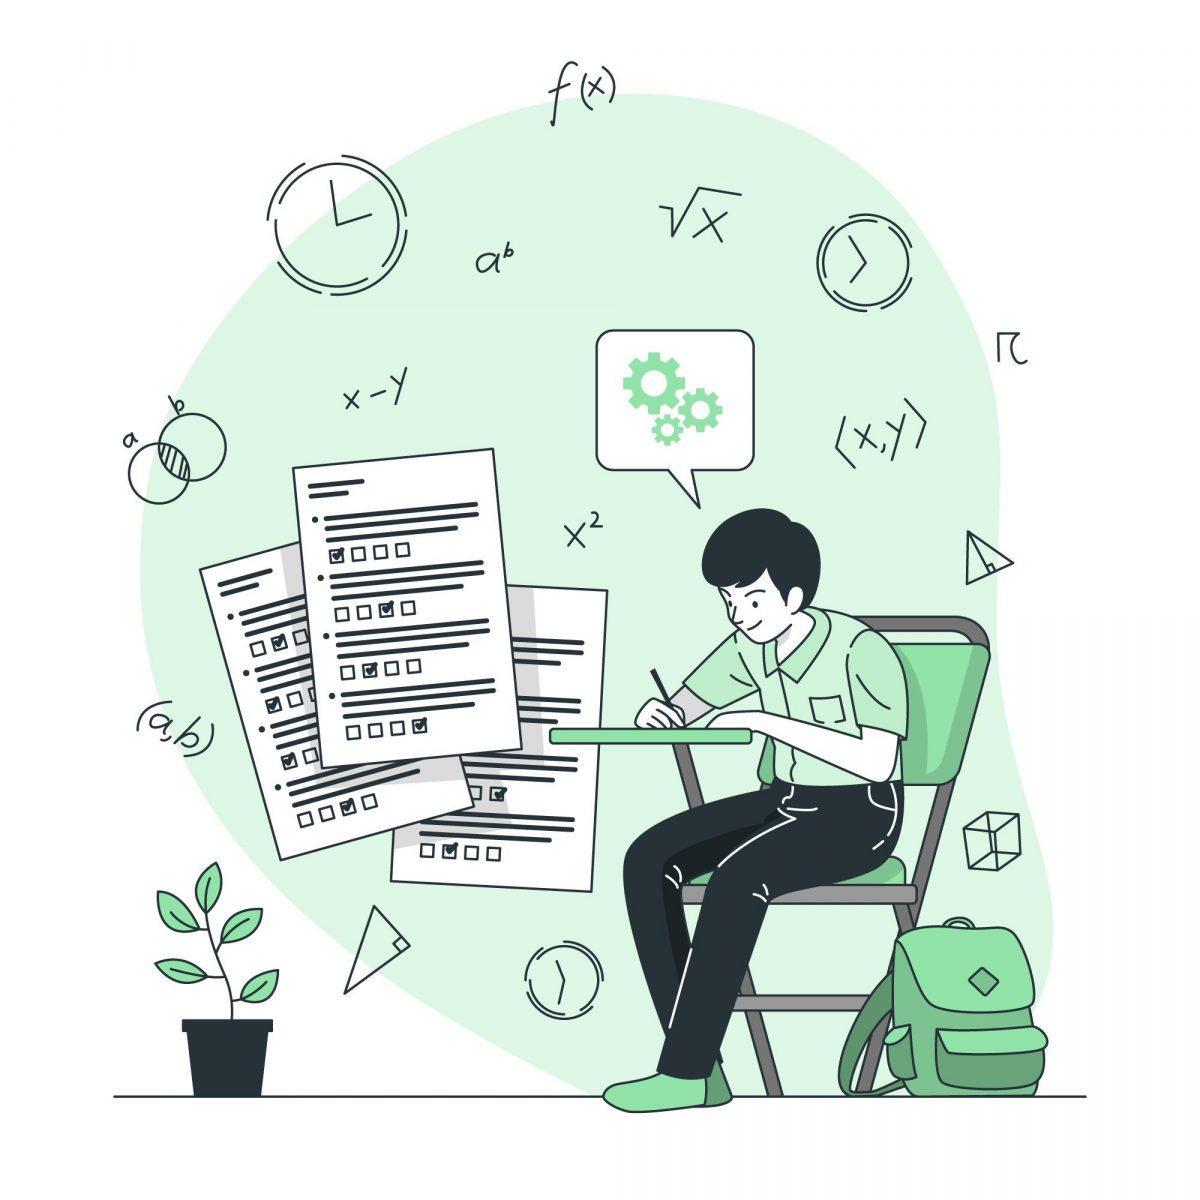 curso enem gratuito - blog kultivi